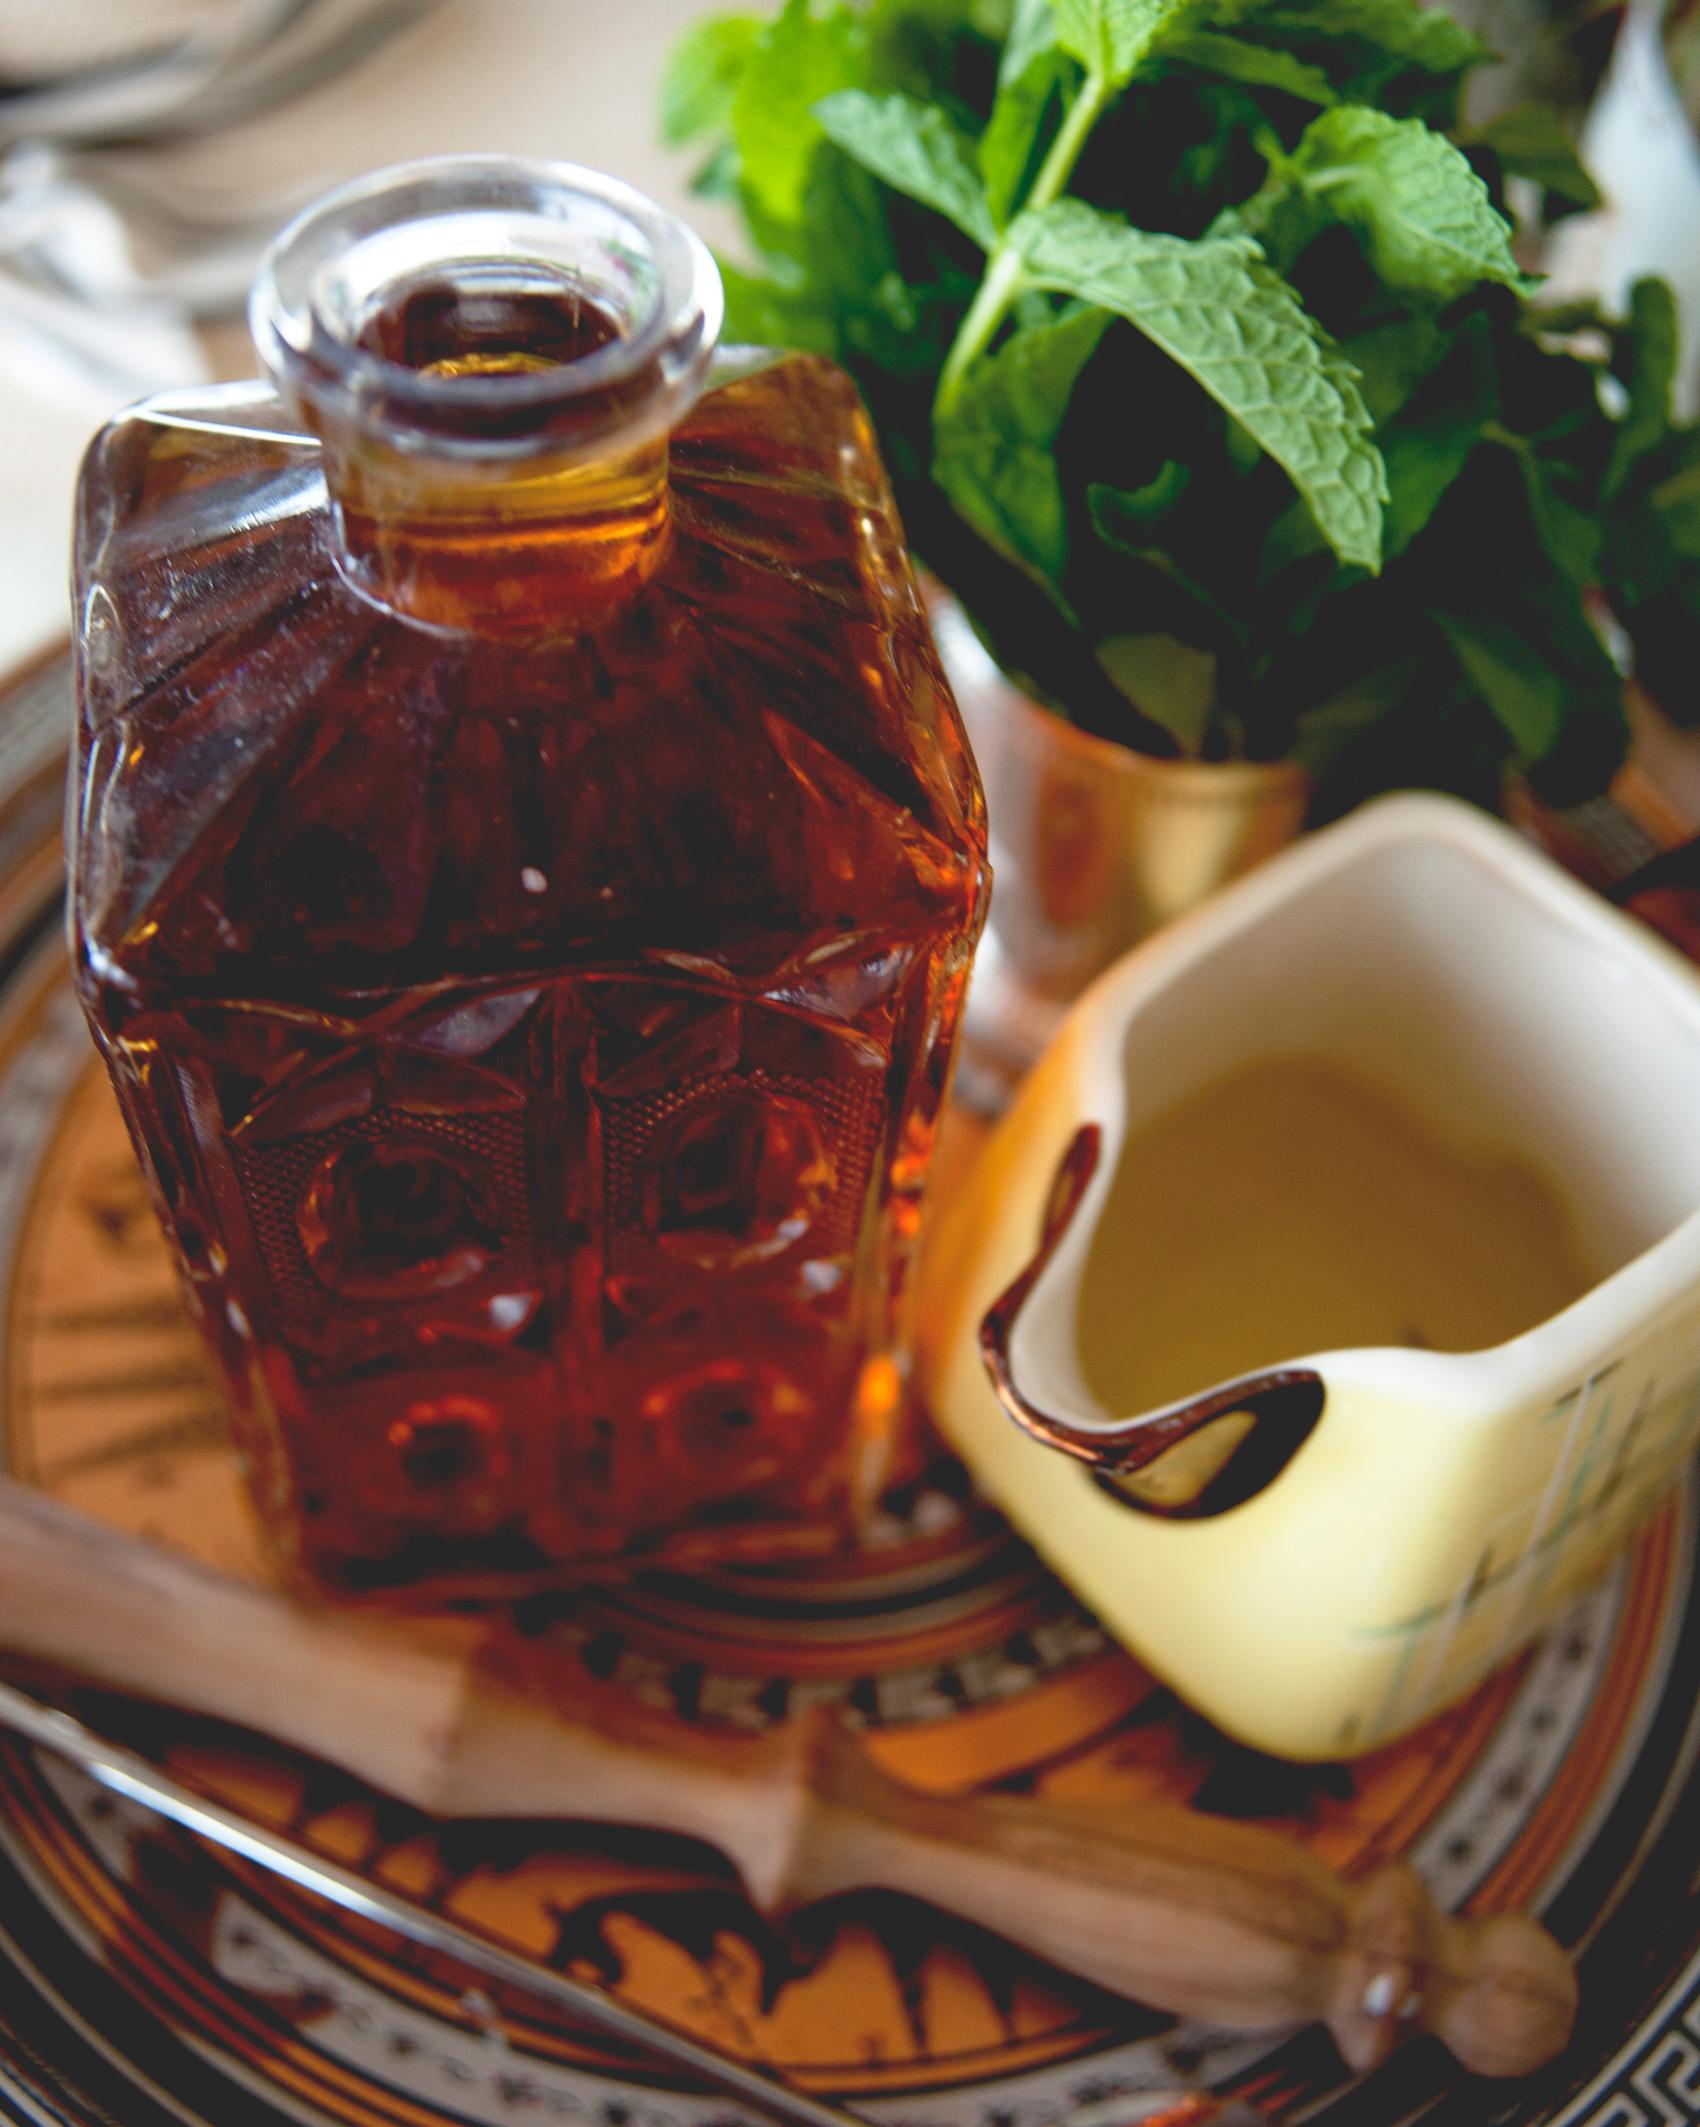 claire-thomas-bridal-shower-derby-mint-julep-ingredients-0814.jpg